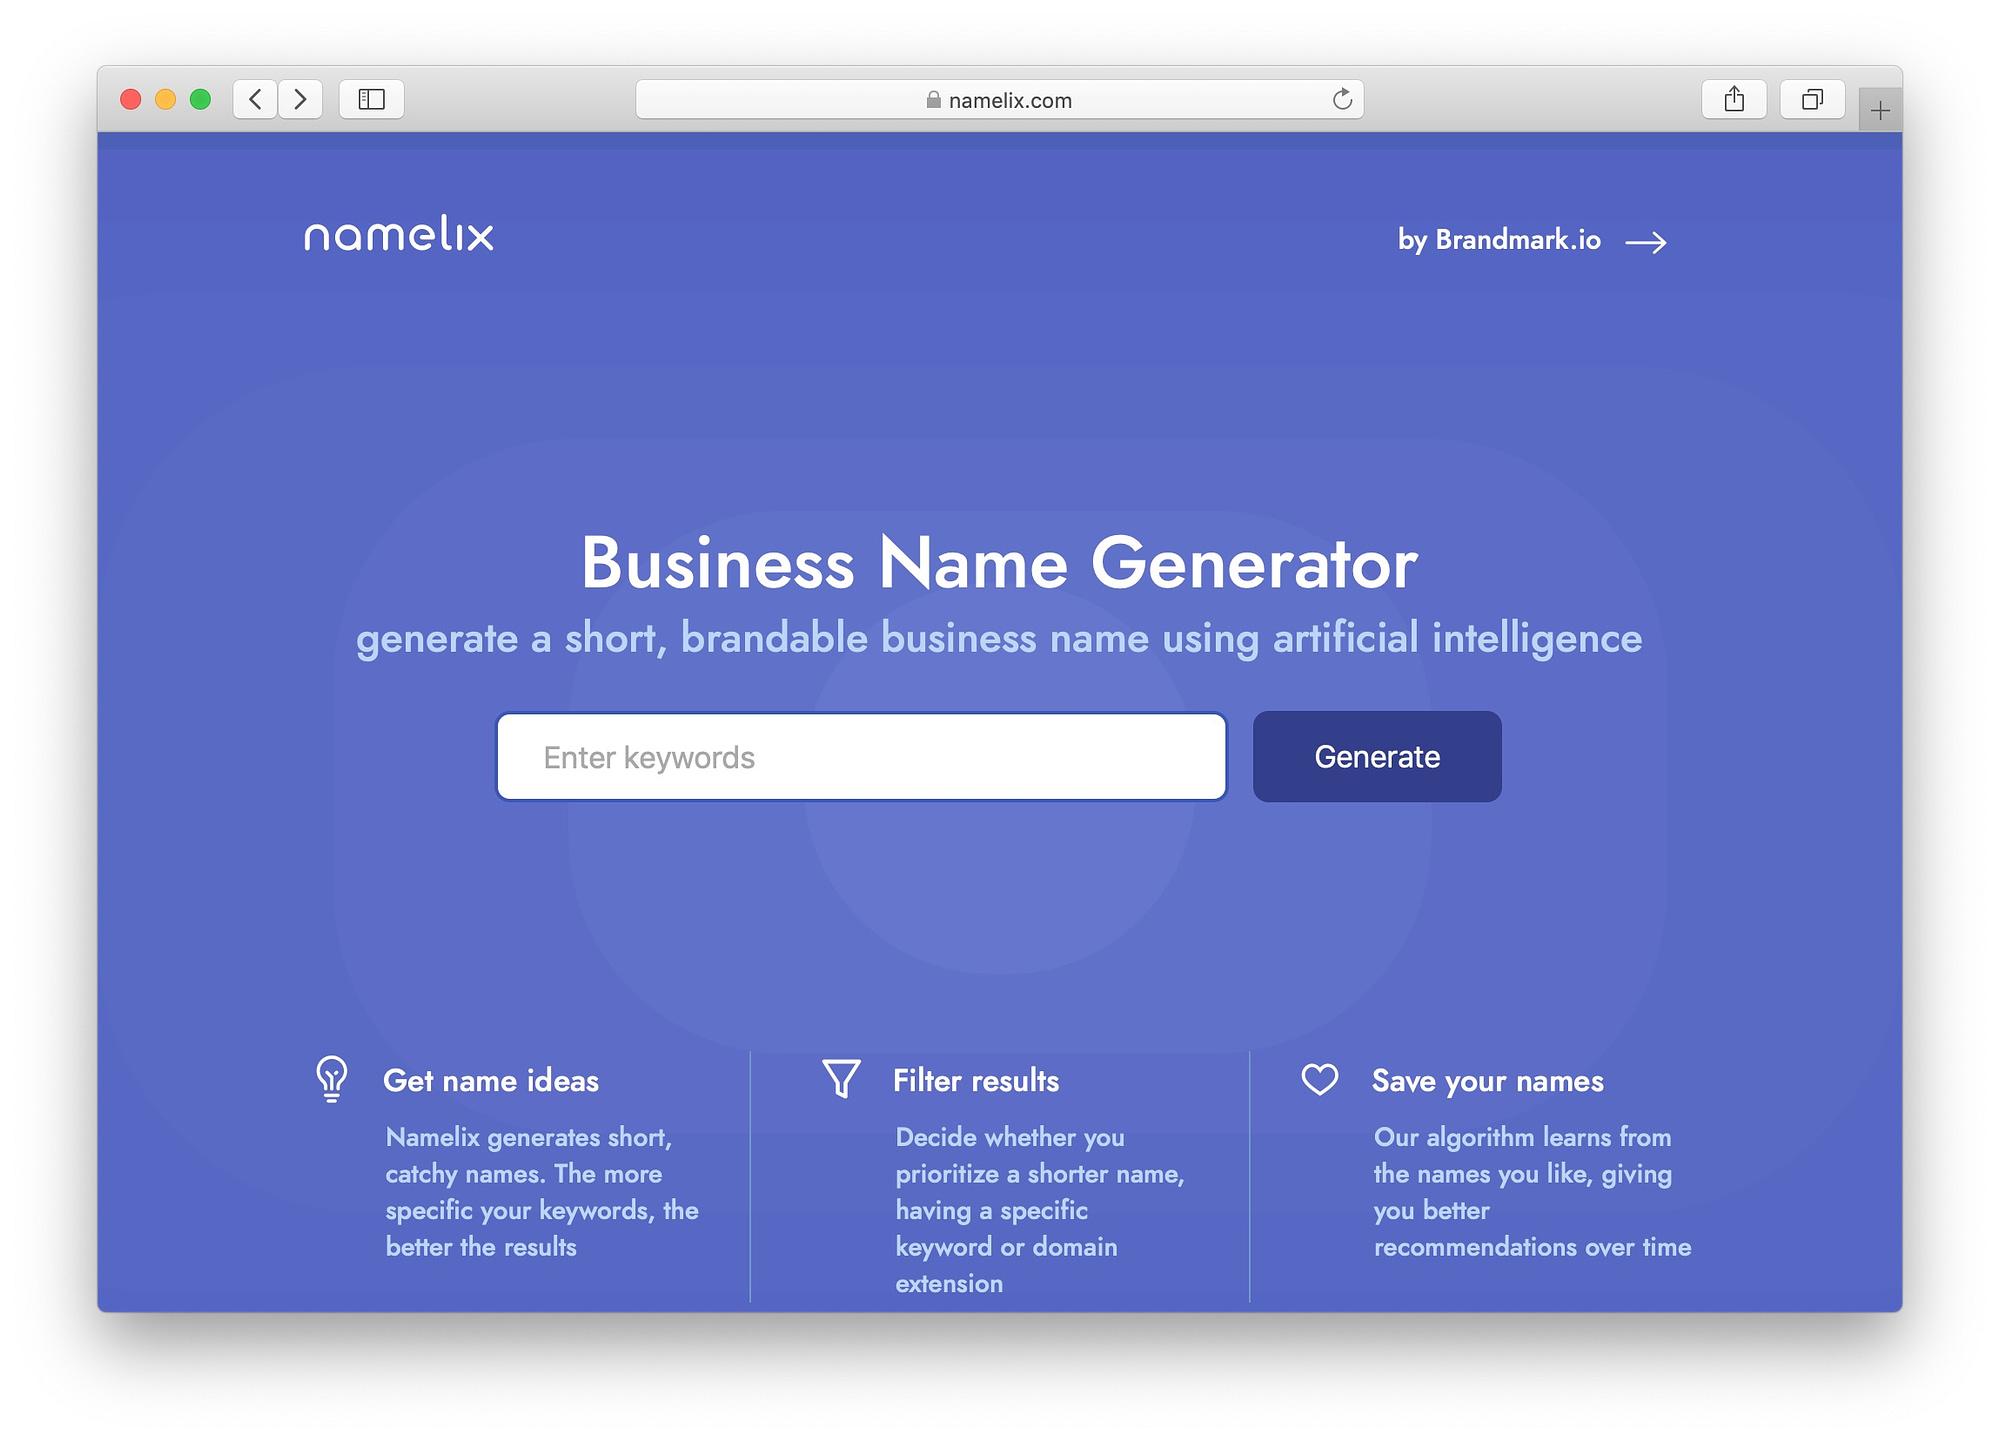 Best free business name generators: Namelix